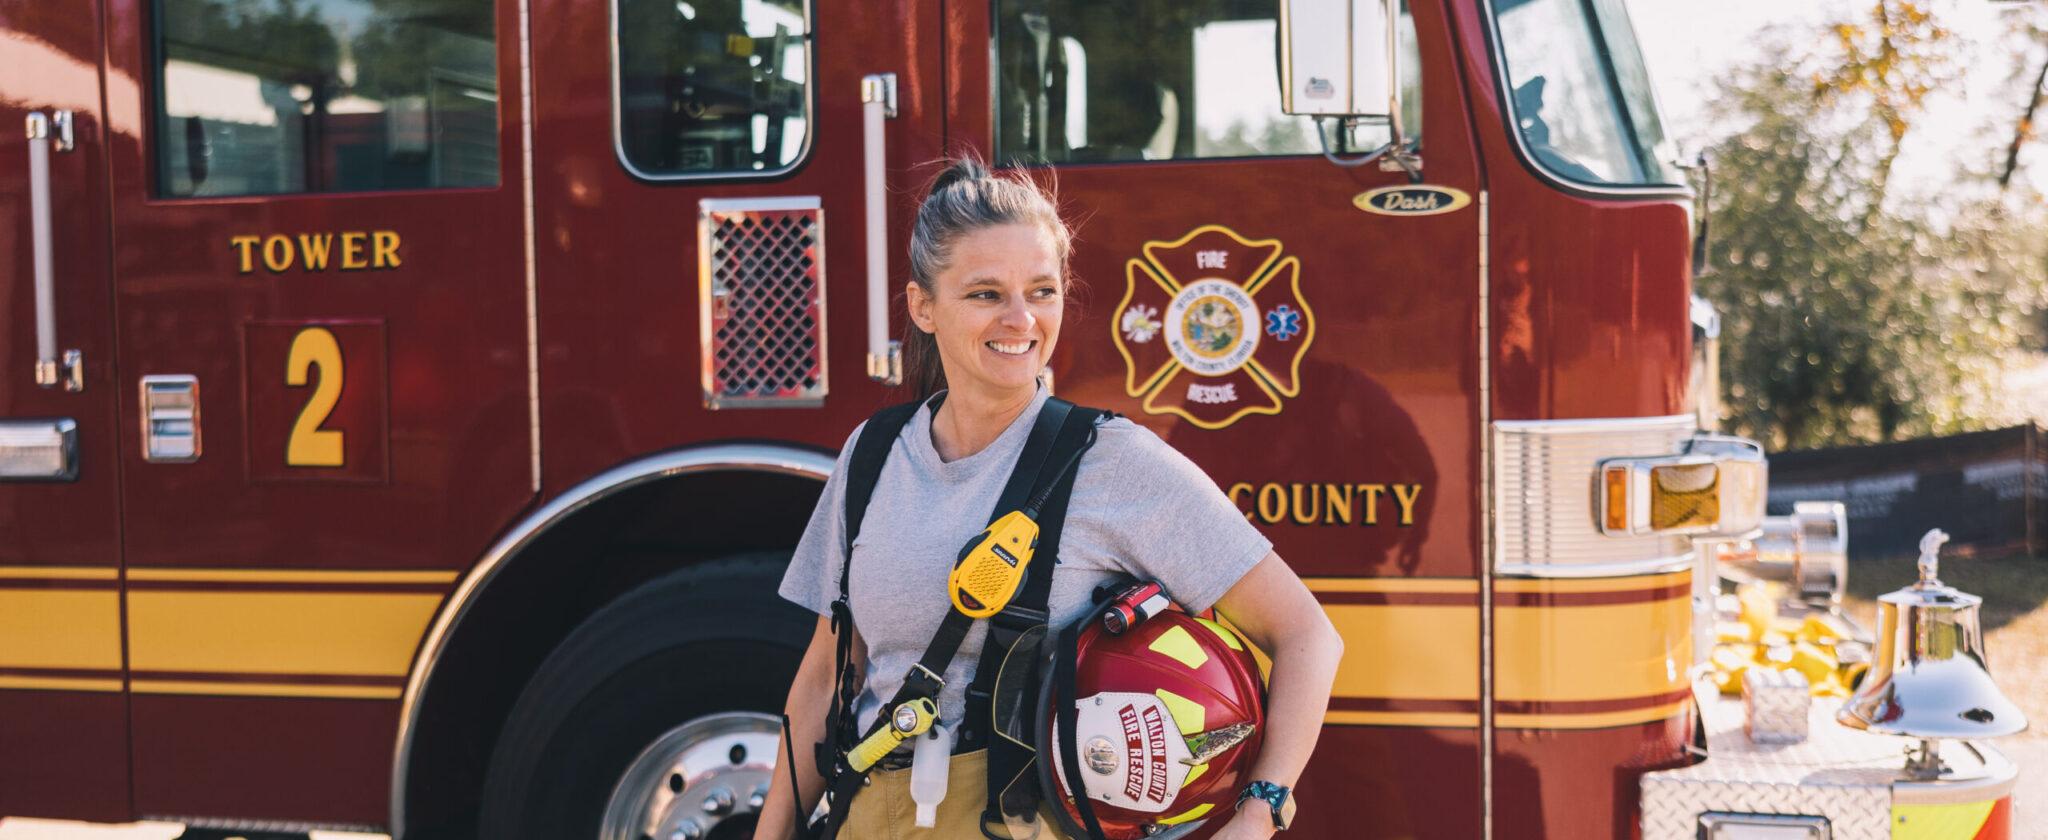 White female firefighter standing in front of fire engine holding helmet